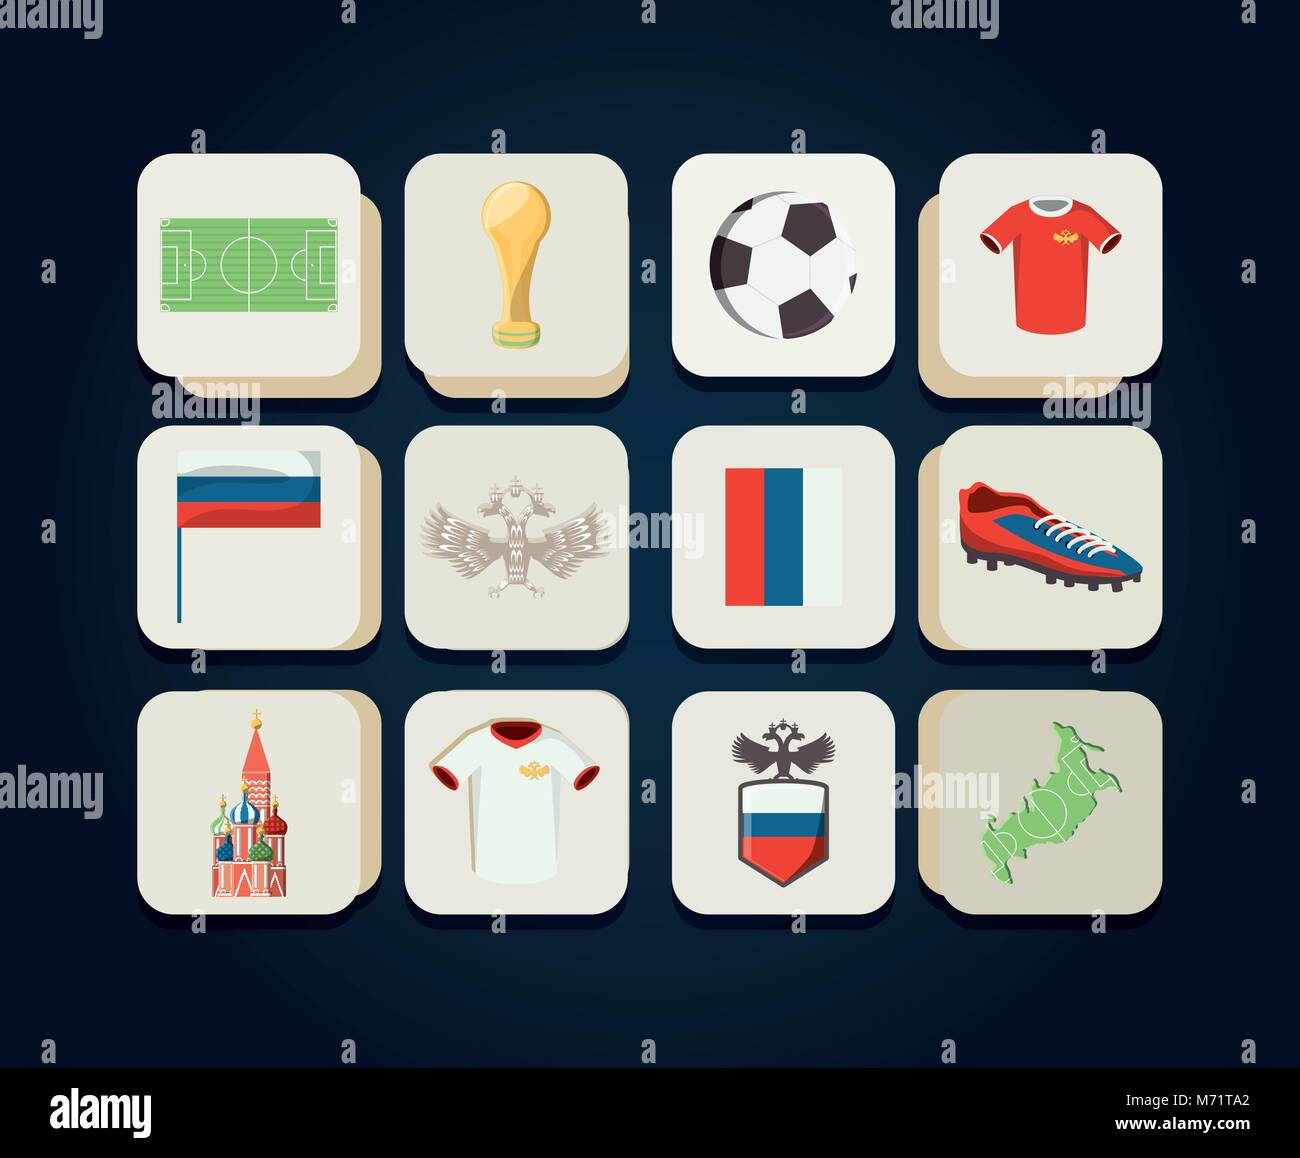 Berühmt Leere Fußball Quadrate Vorlage Galerie ...